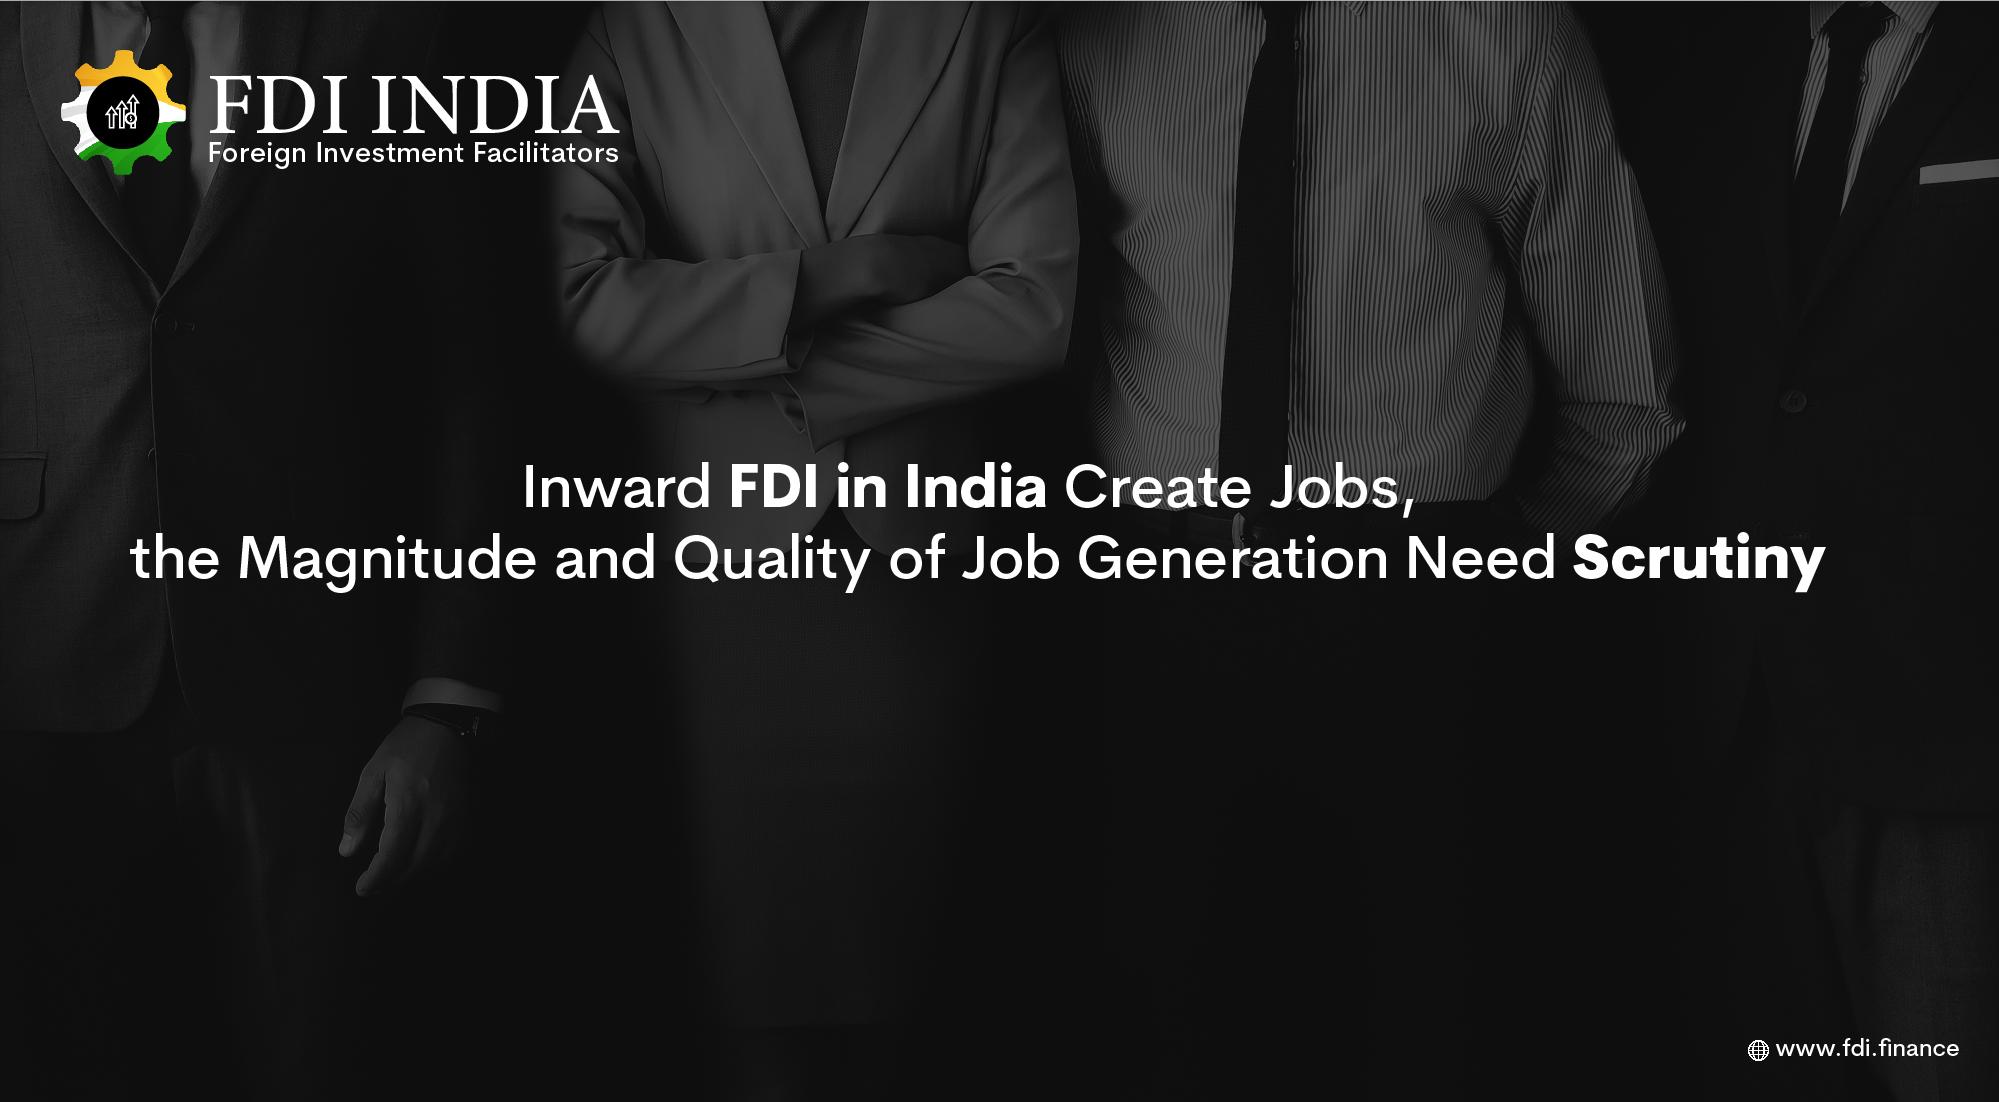 Inward FDI in India Create Jobs, the Magnitude and Quality of Job Generation Need Scrutiny